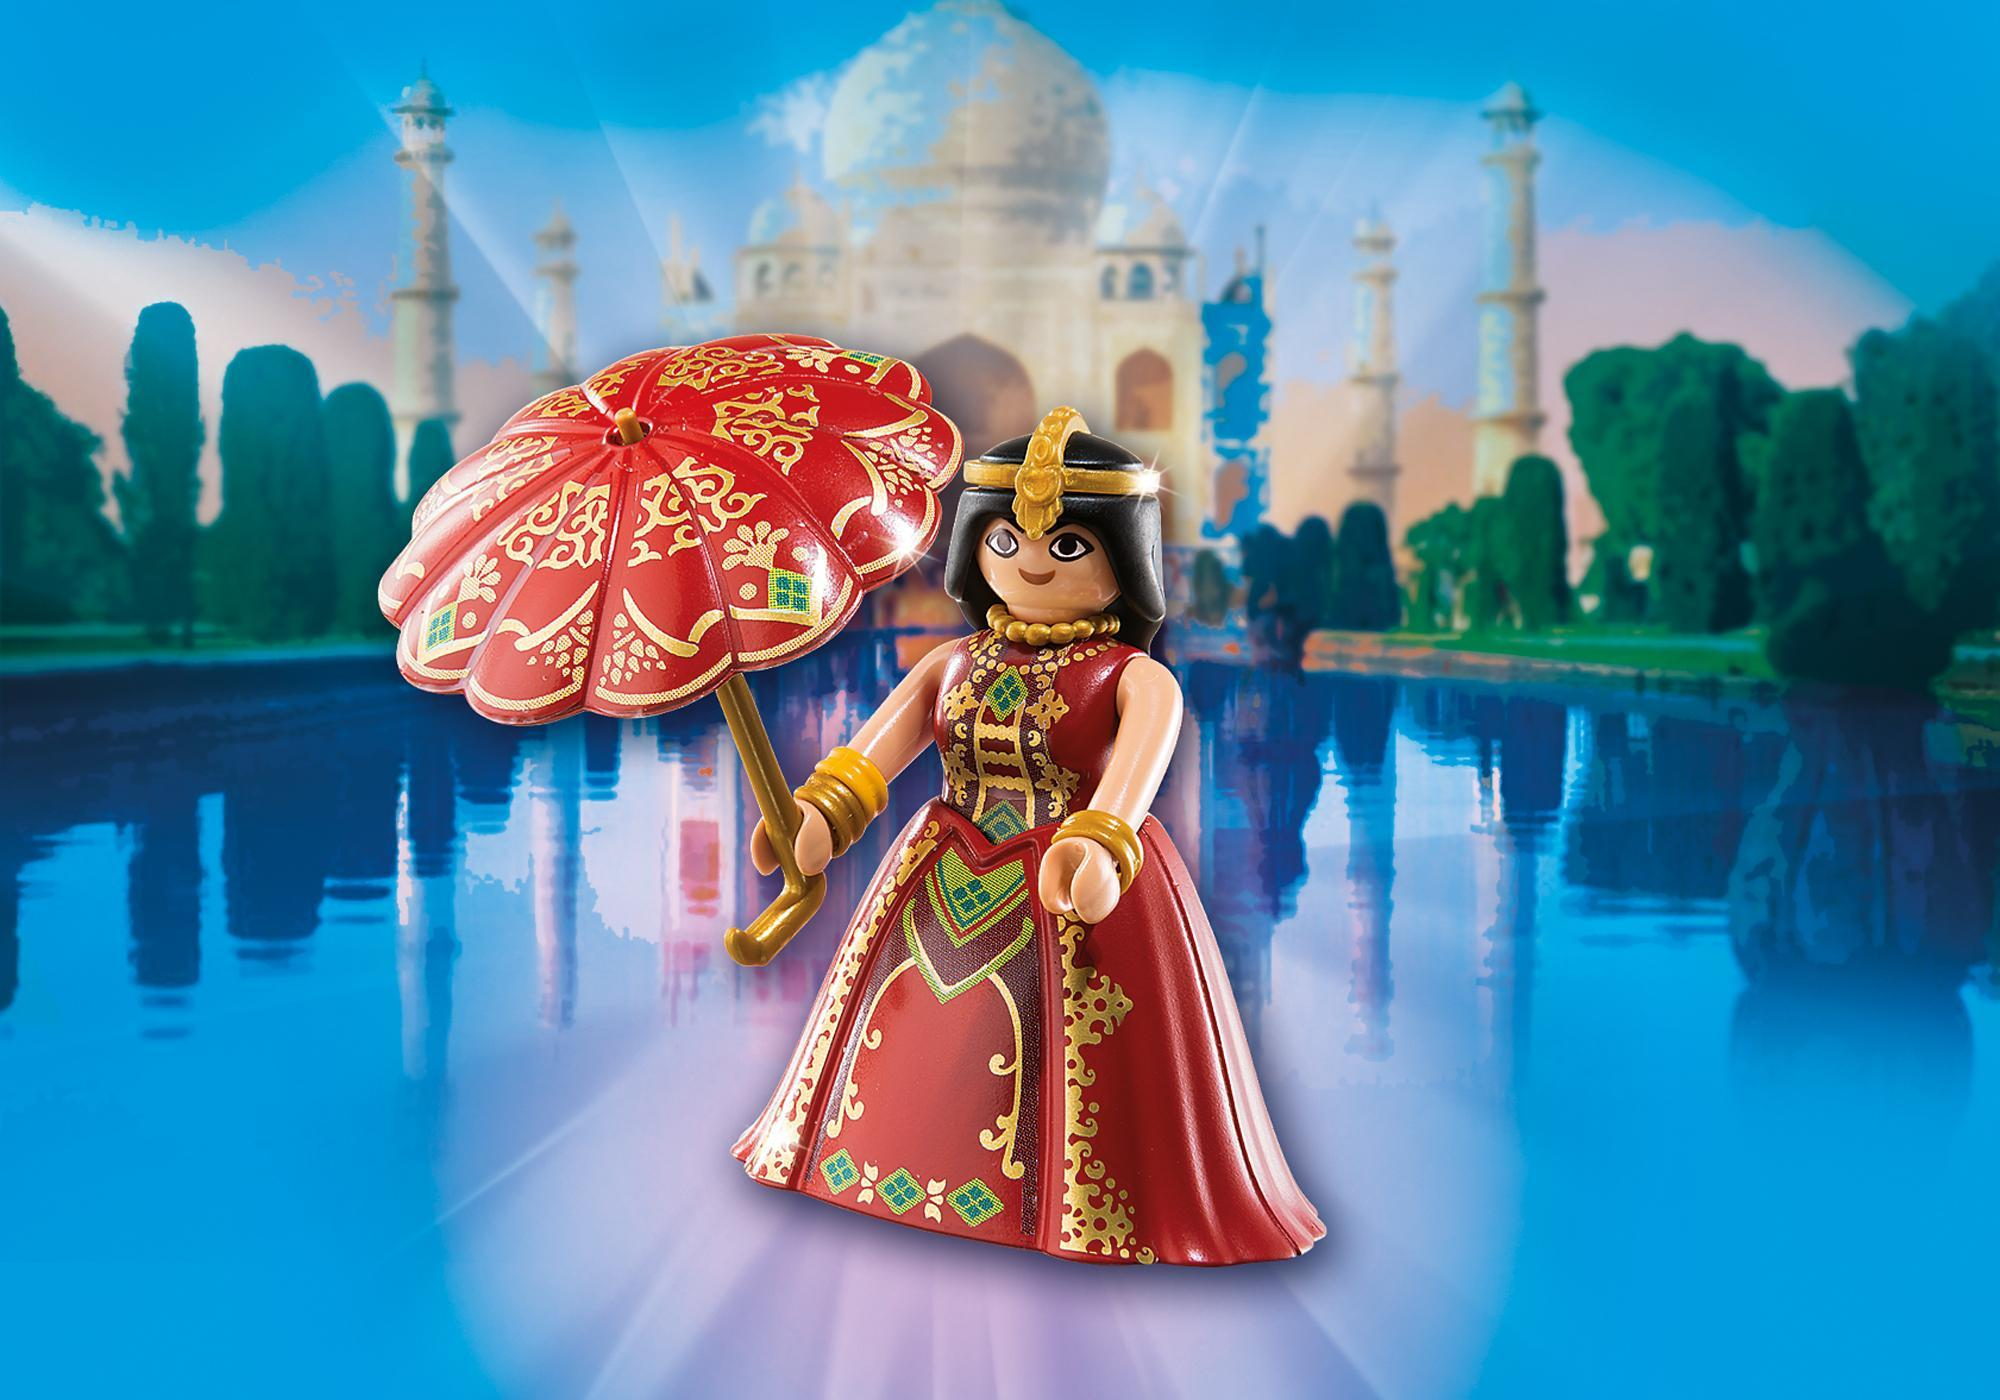 6825_product_detail/Princesa de la India